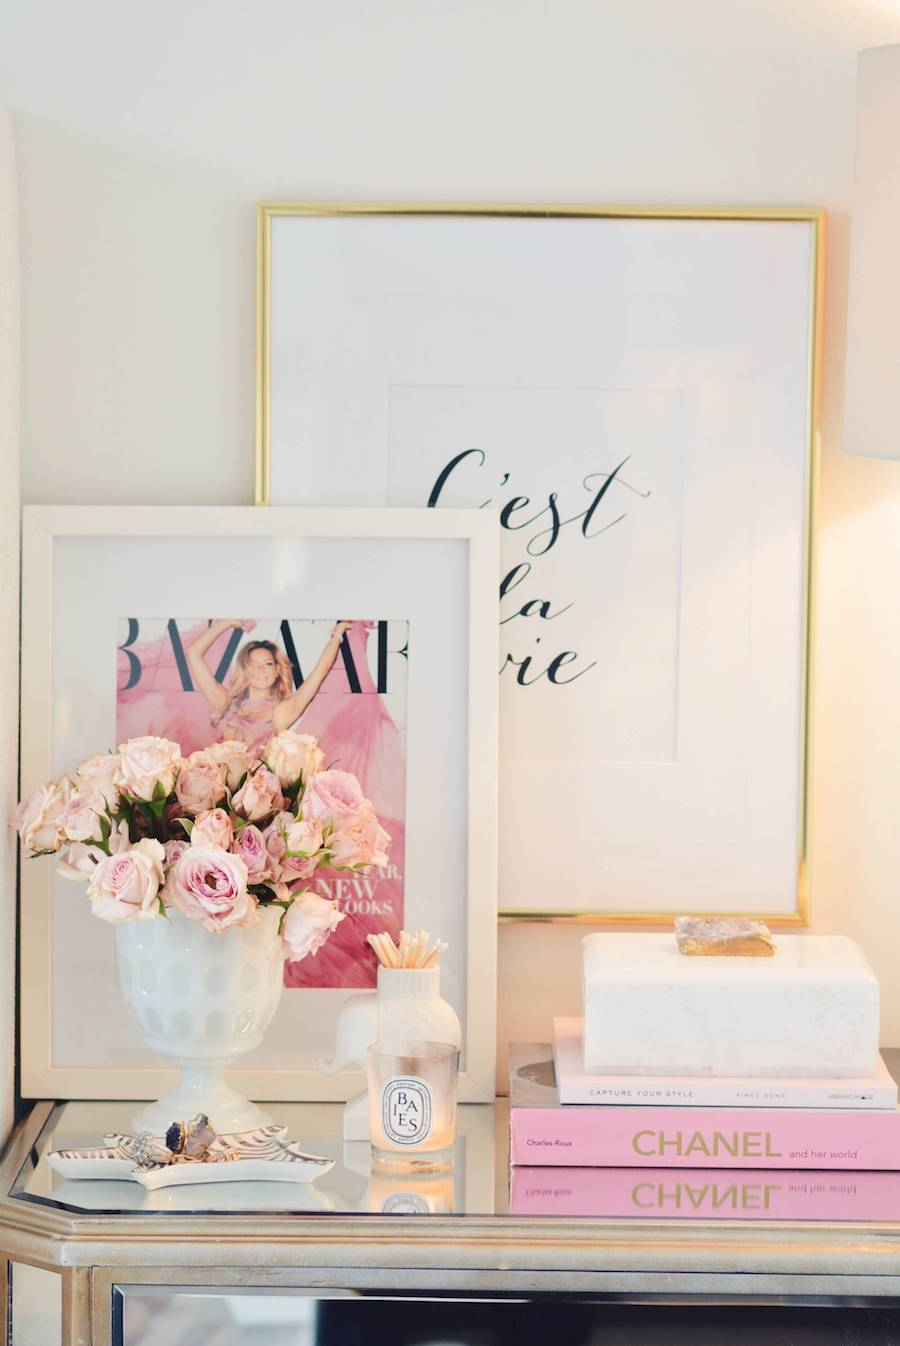 Stacked artwork on mirrored dresser